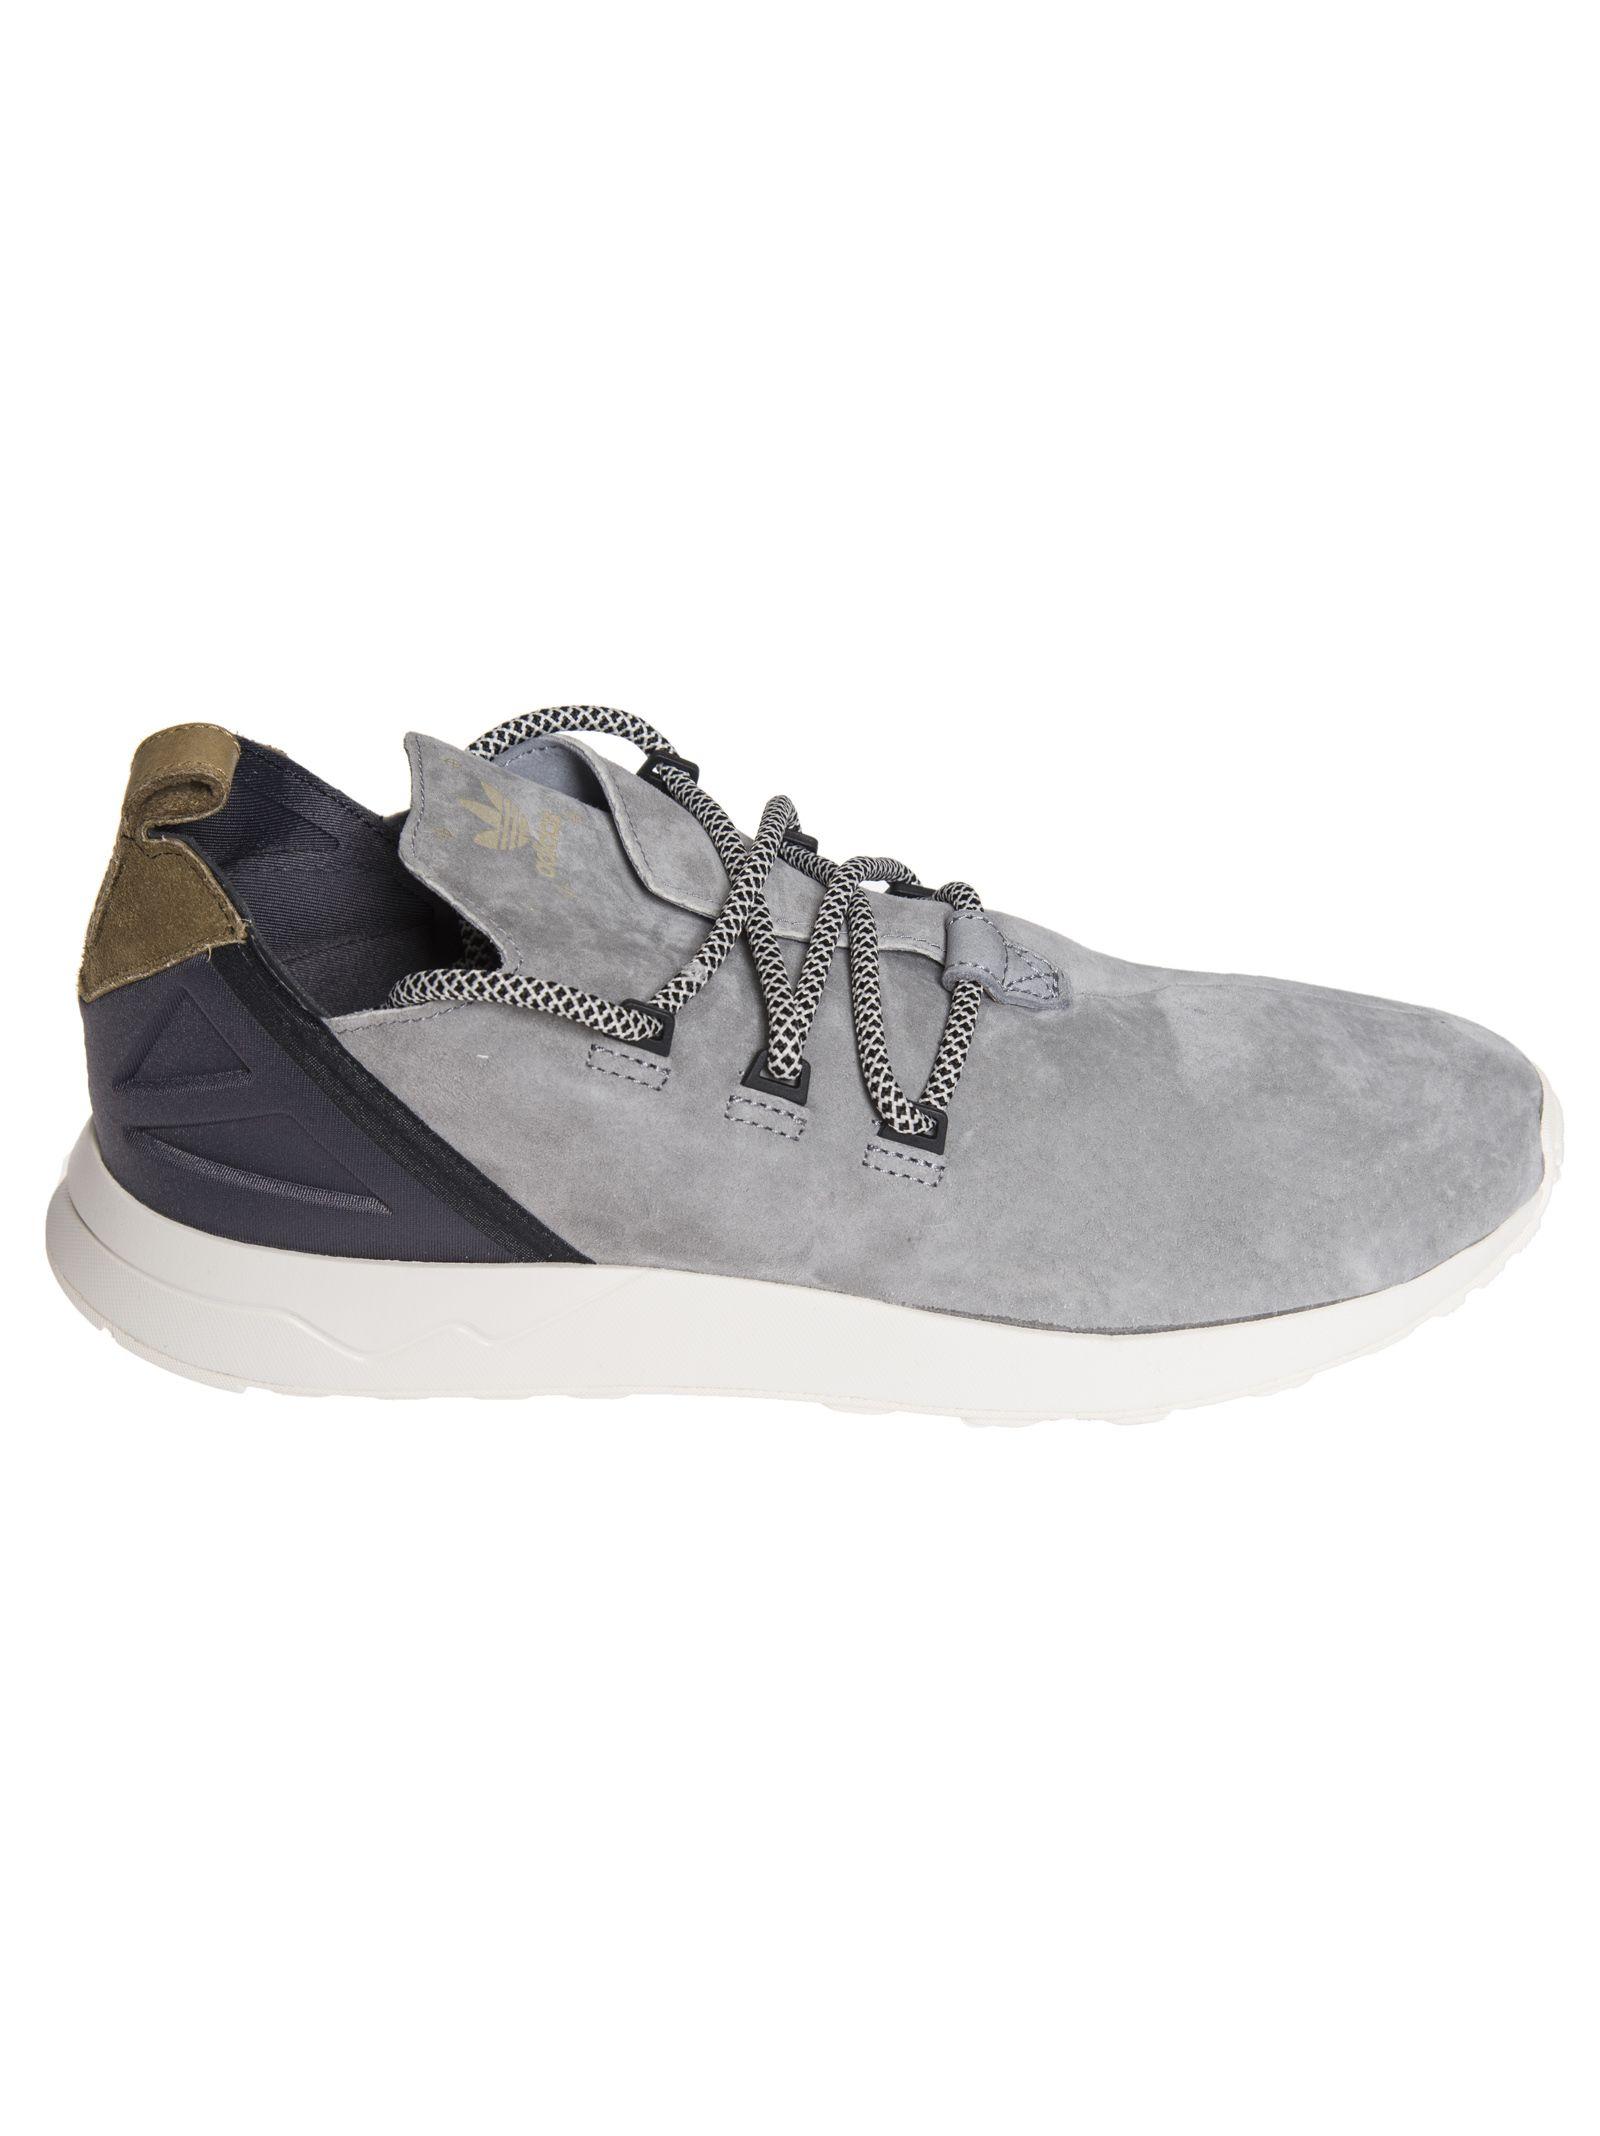 3c792bf46 Adidas Originals ZX Flux ADV X Sneakers - Multicolour ...